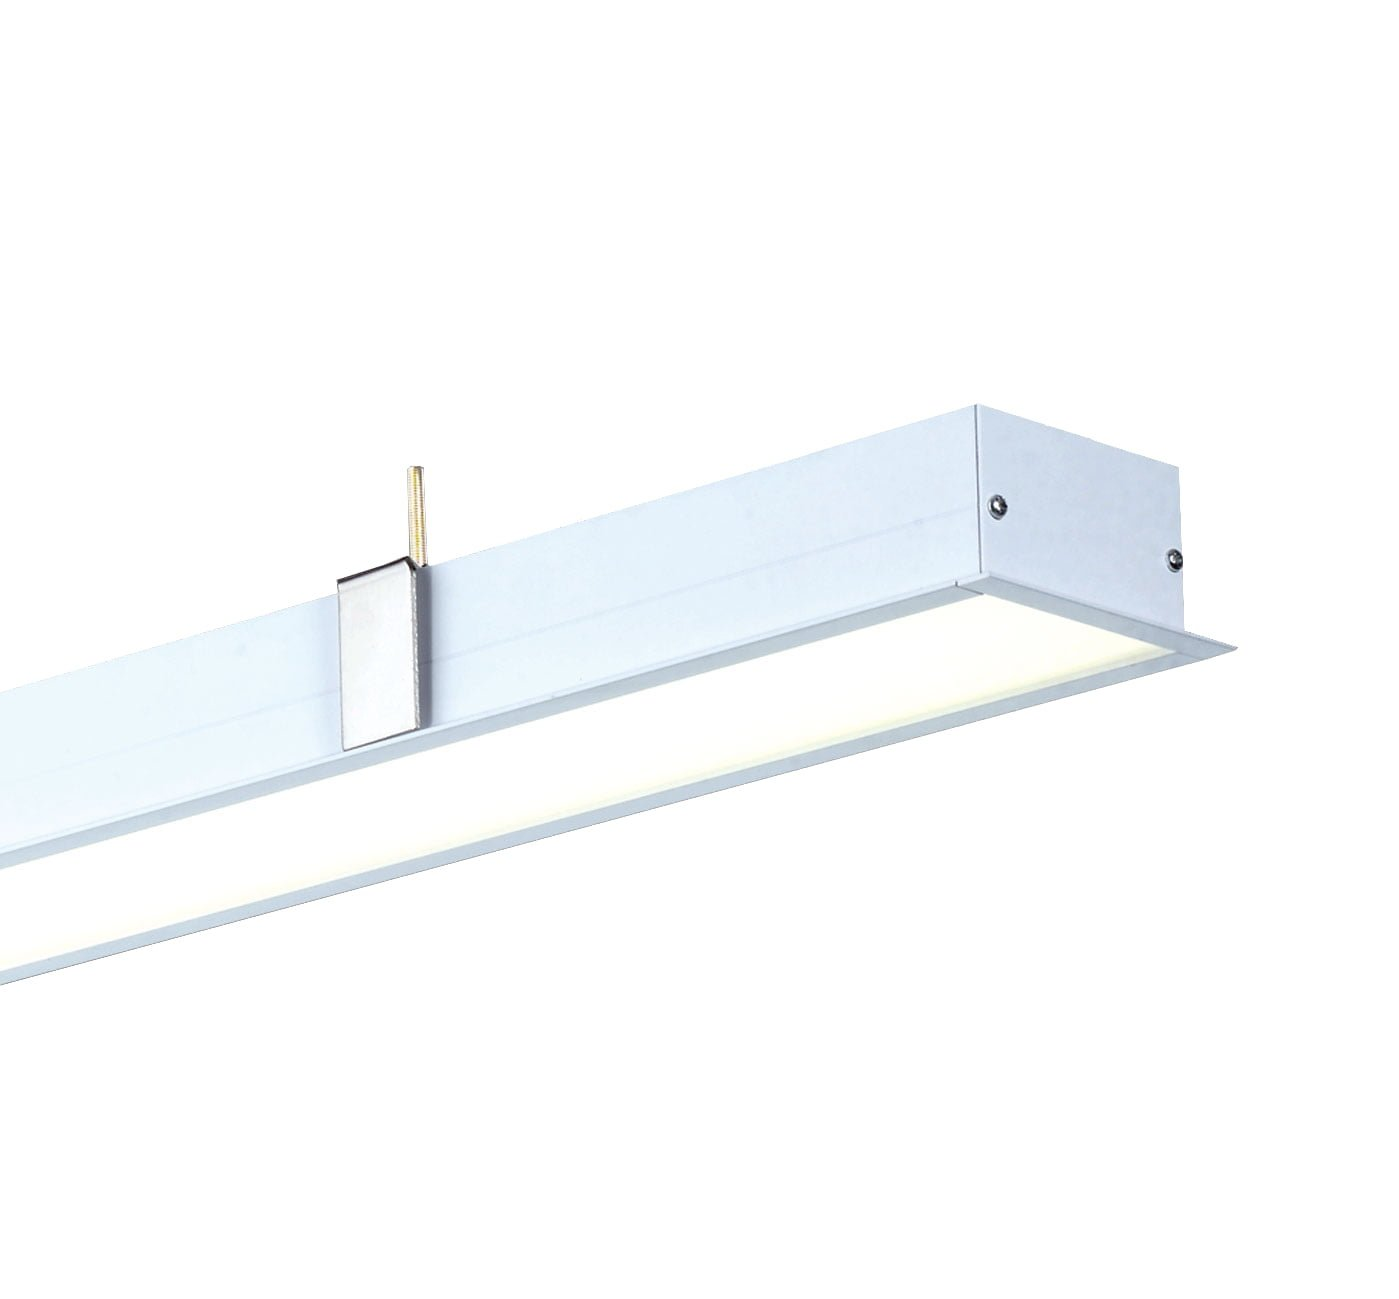 Recessed Linear Lighting Stl279 Sera Technologies